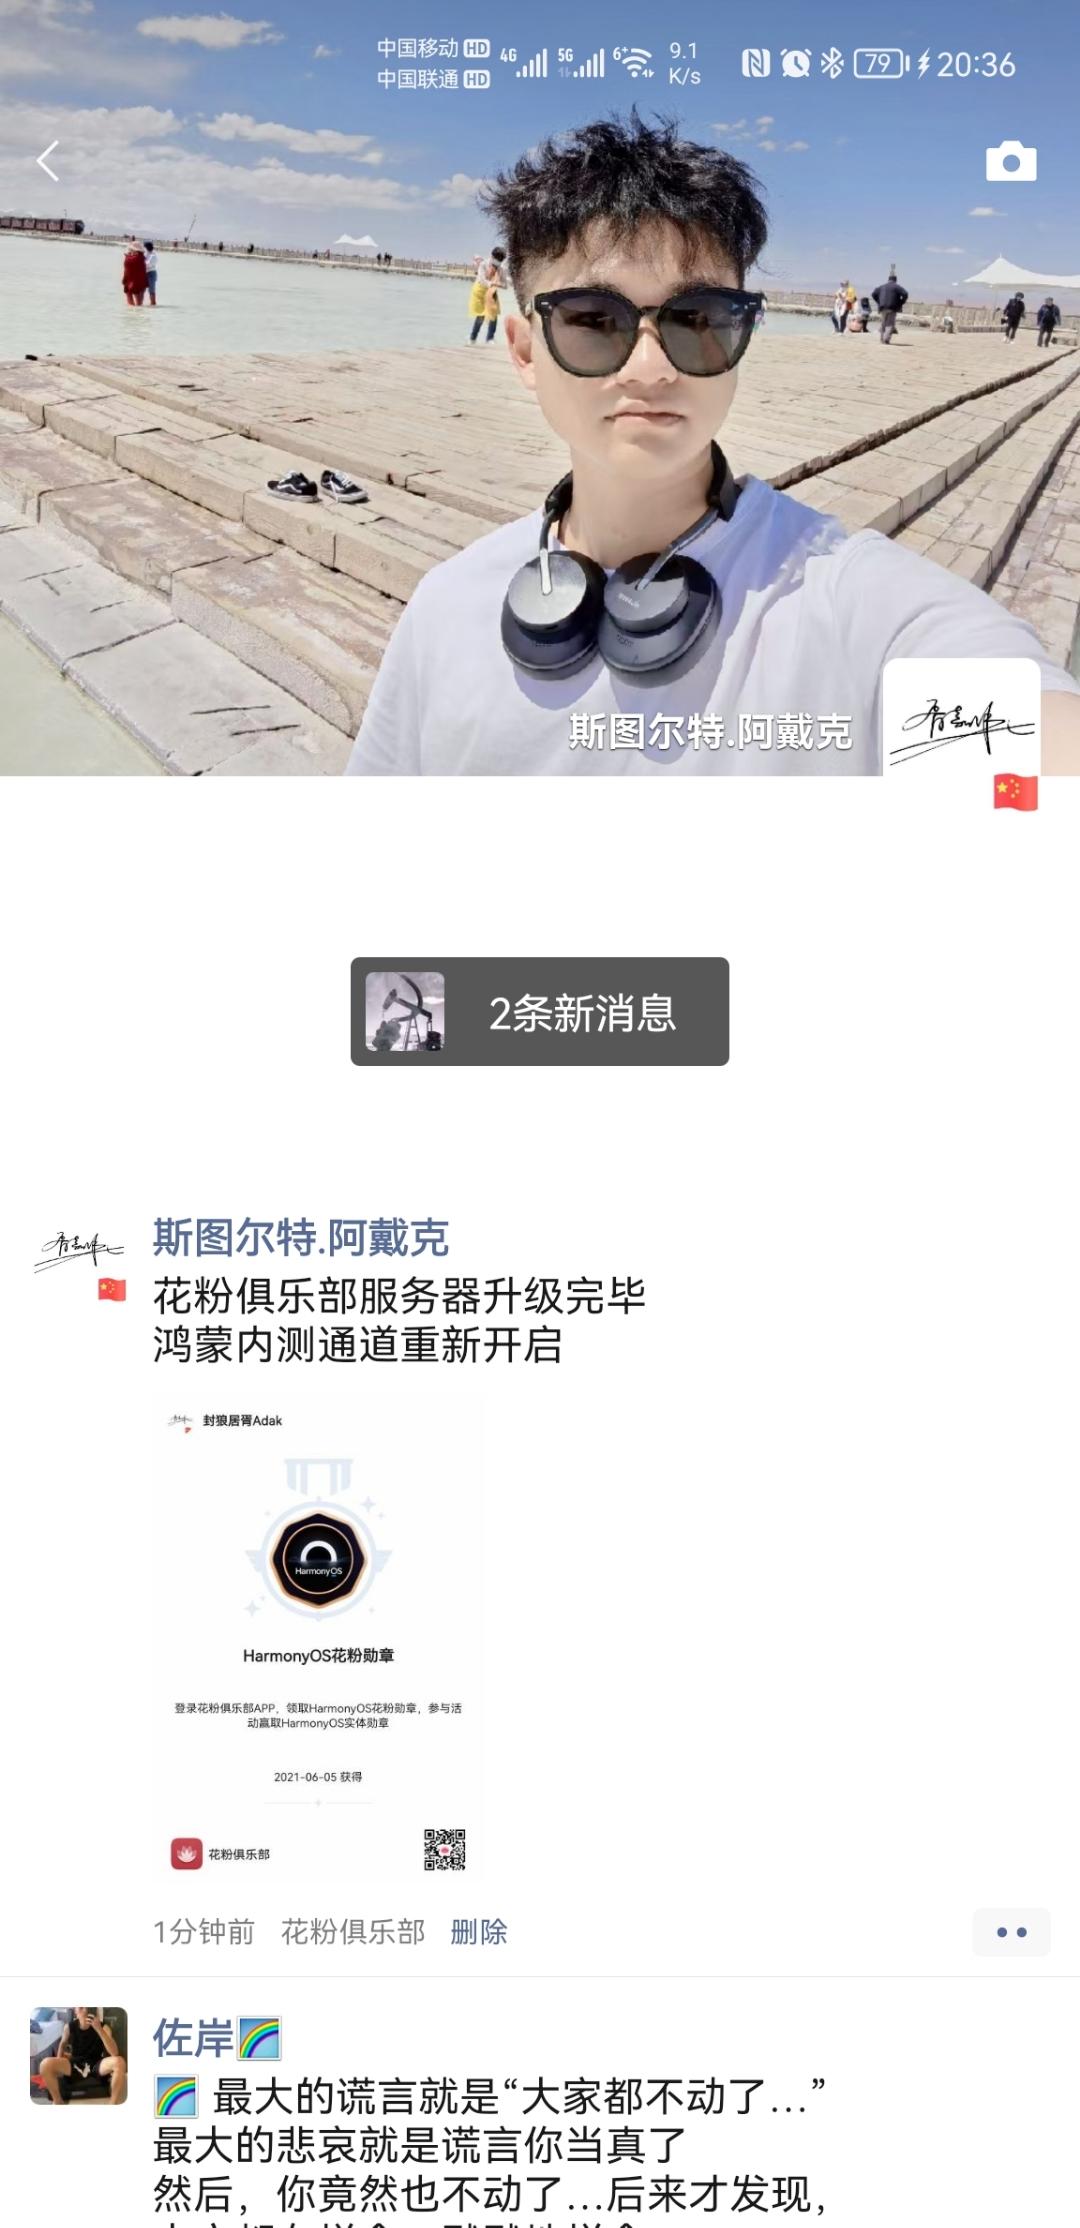 Screenshot_20210605_203607_com.tencent.mm.jpg